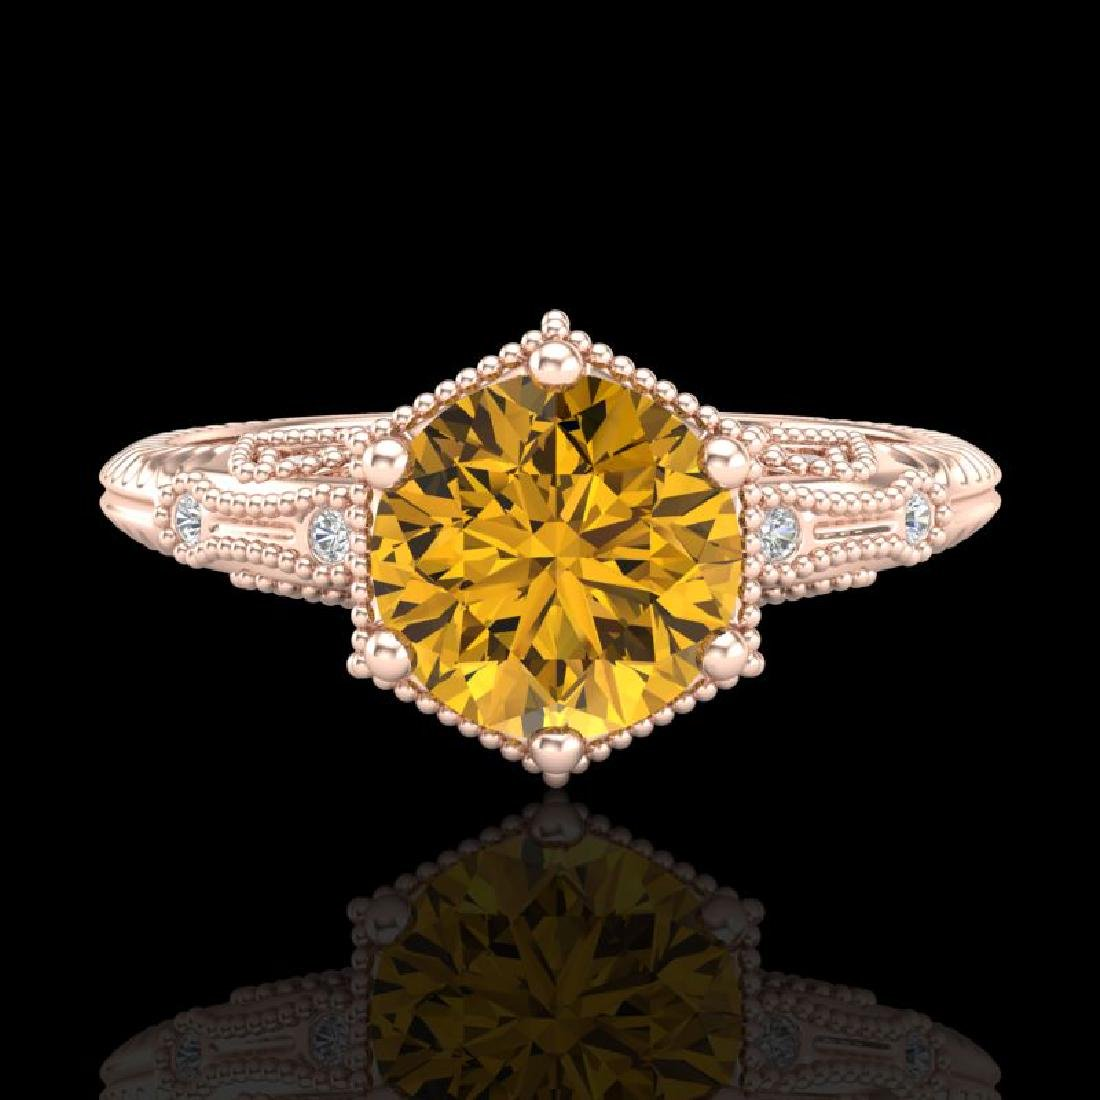 1.17 CTW Intense Fancy Yellow Diamond Engagement Art - 2